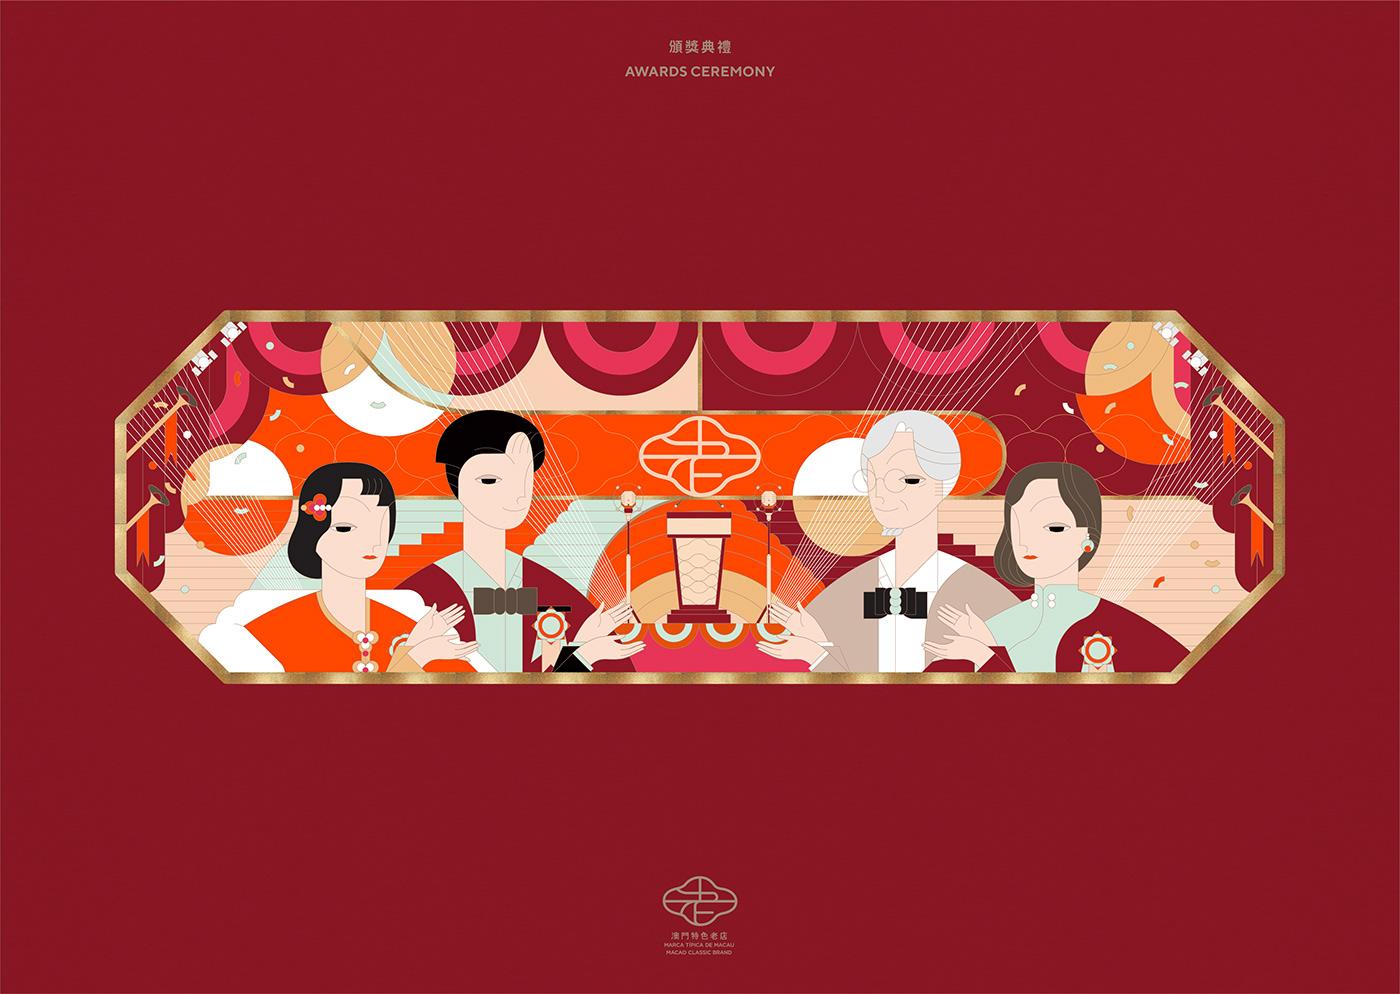 Macao macau graphic branding  Classic untitled macao untitled design AU CHON HIN design adobeawards